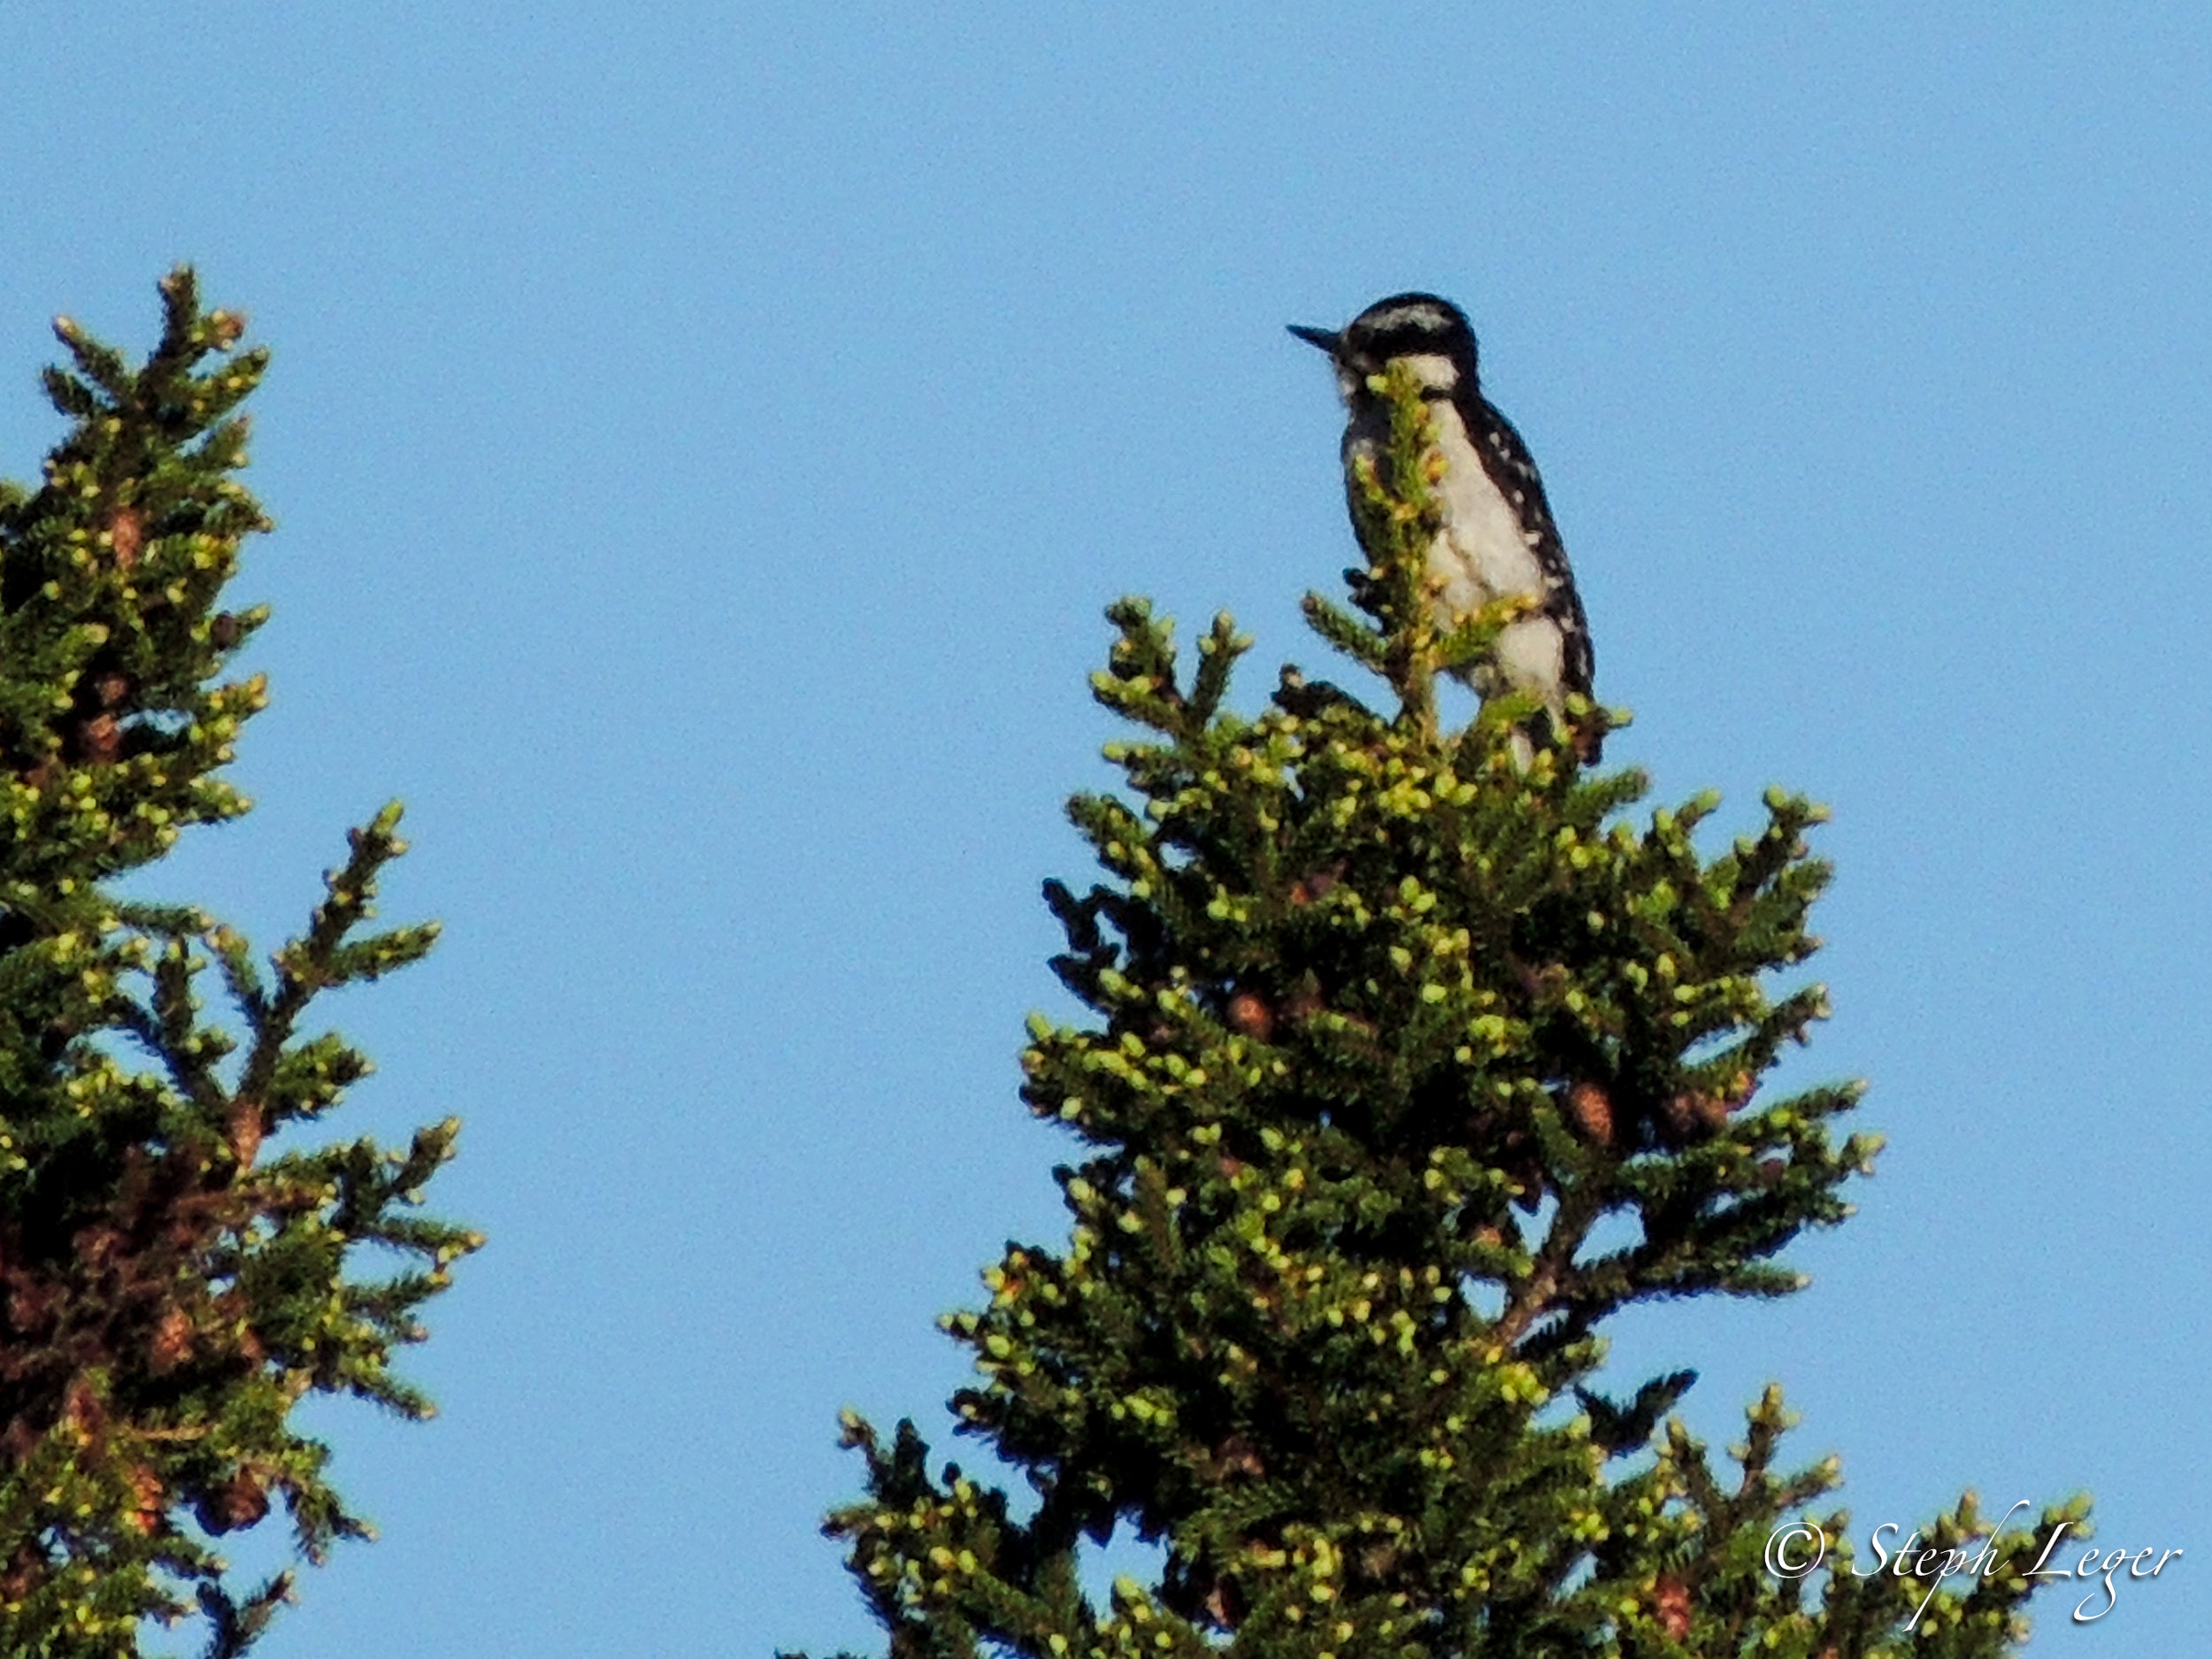 Hairy Woodpecker ( Leuconotopicus villosus ) female - Terra Nova National Park, Newfoundland